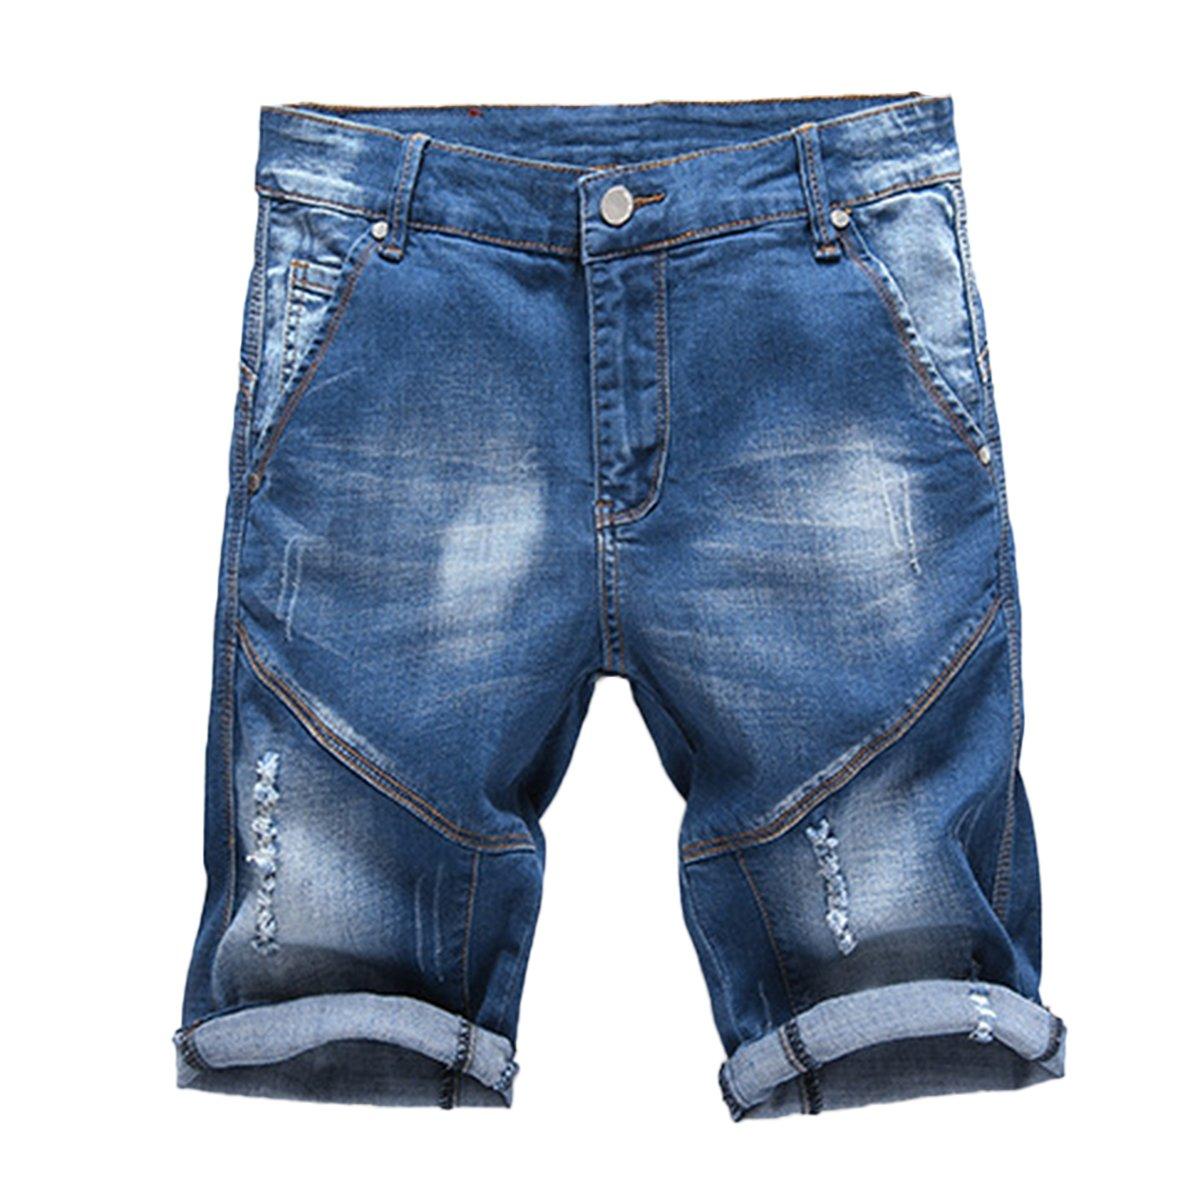 Cloudstyle Men's Fashion 5 Pocket Stretch Denim Jean Knee Shorts